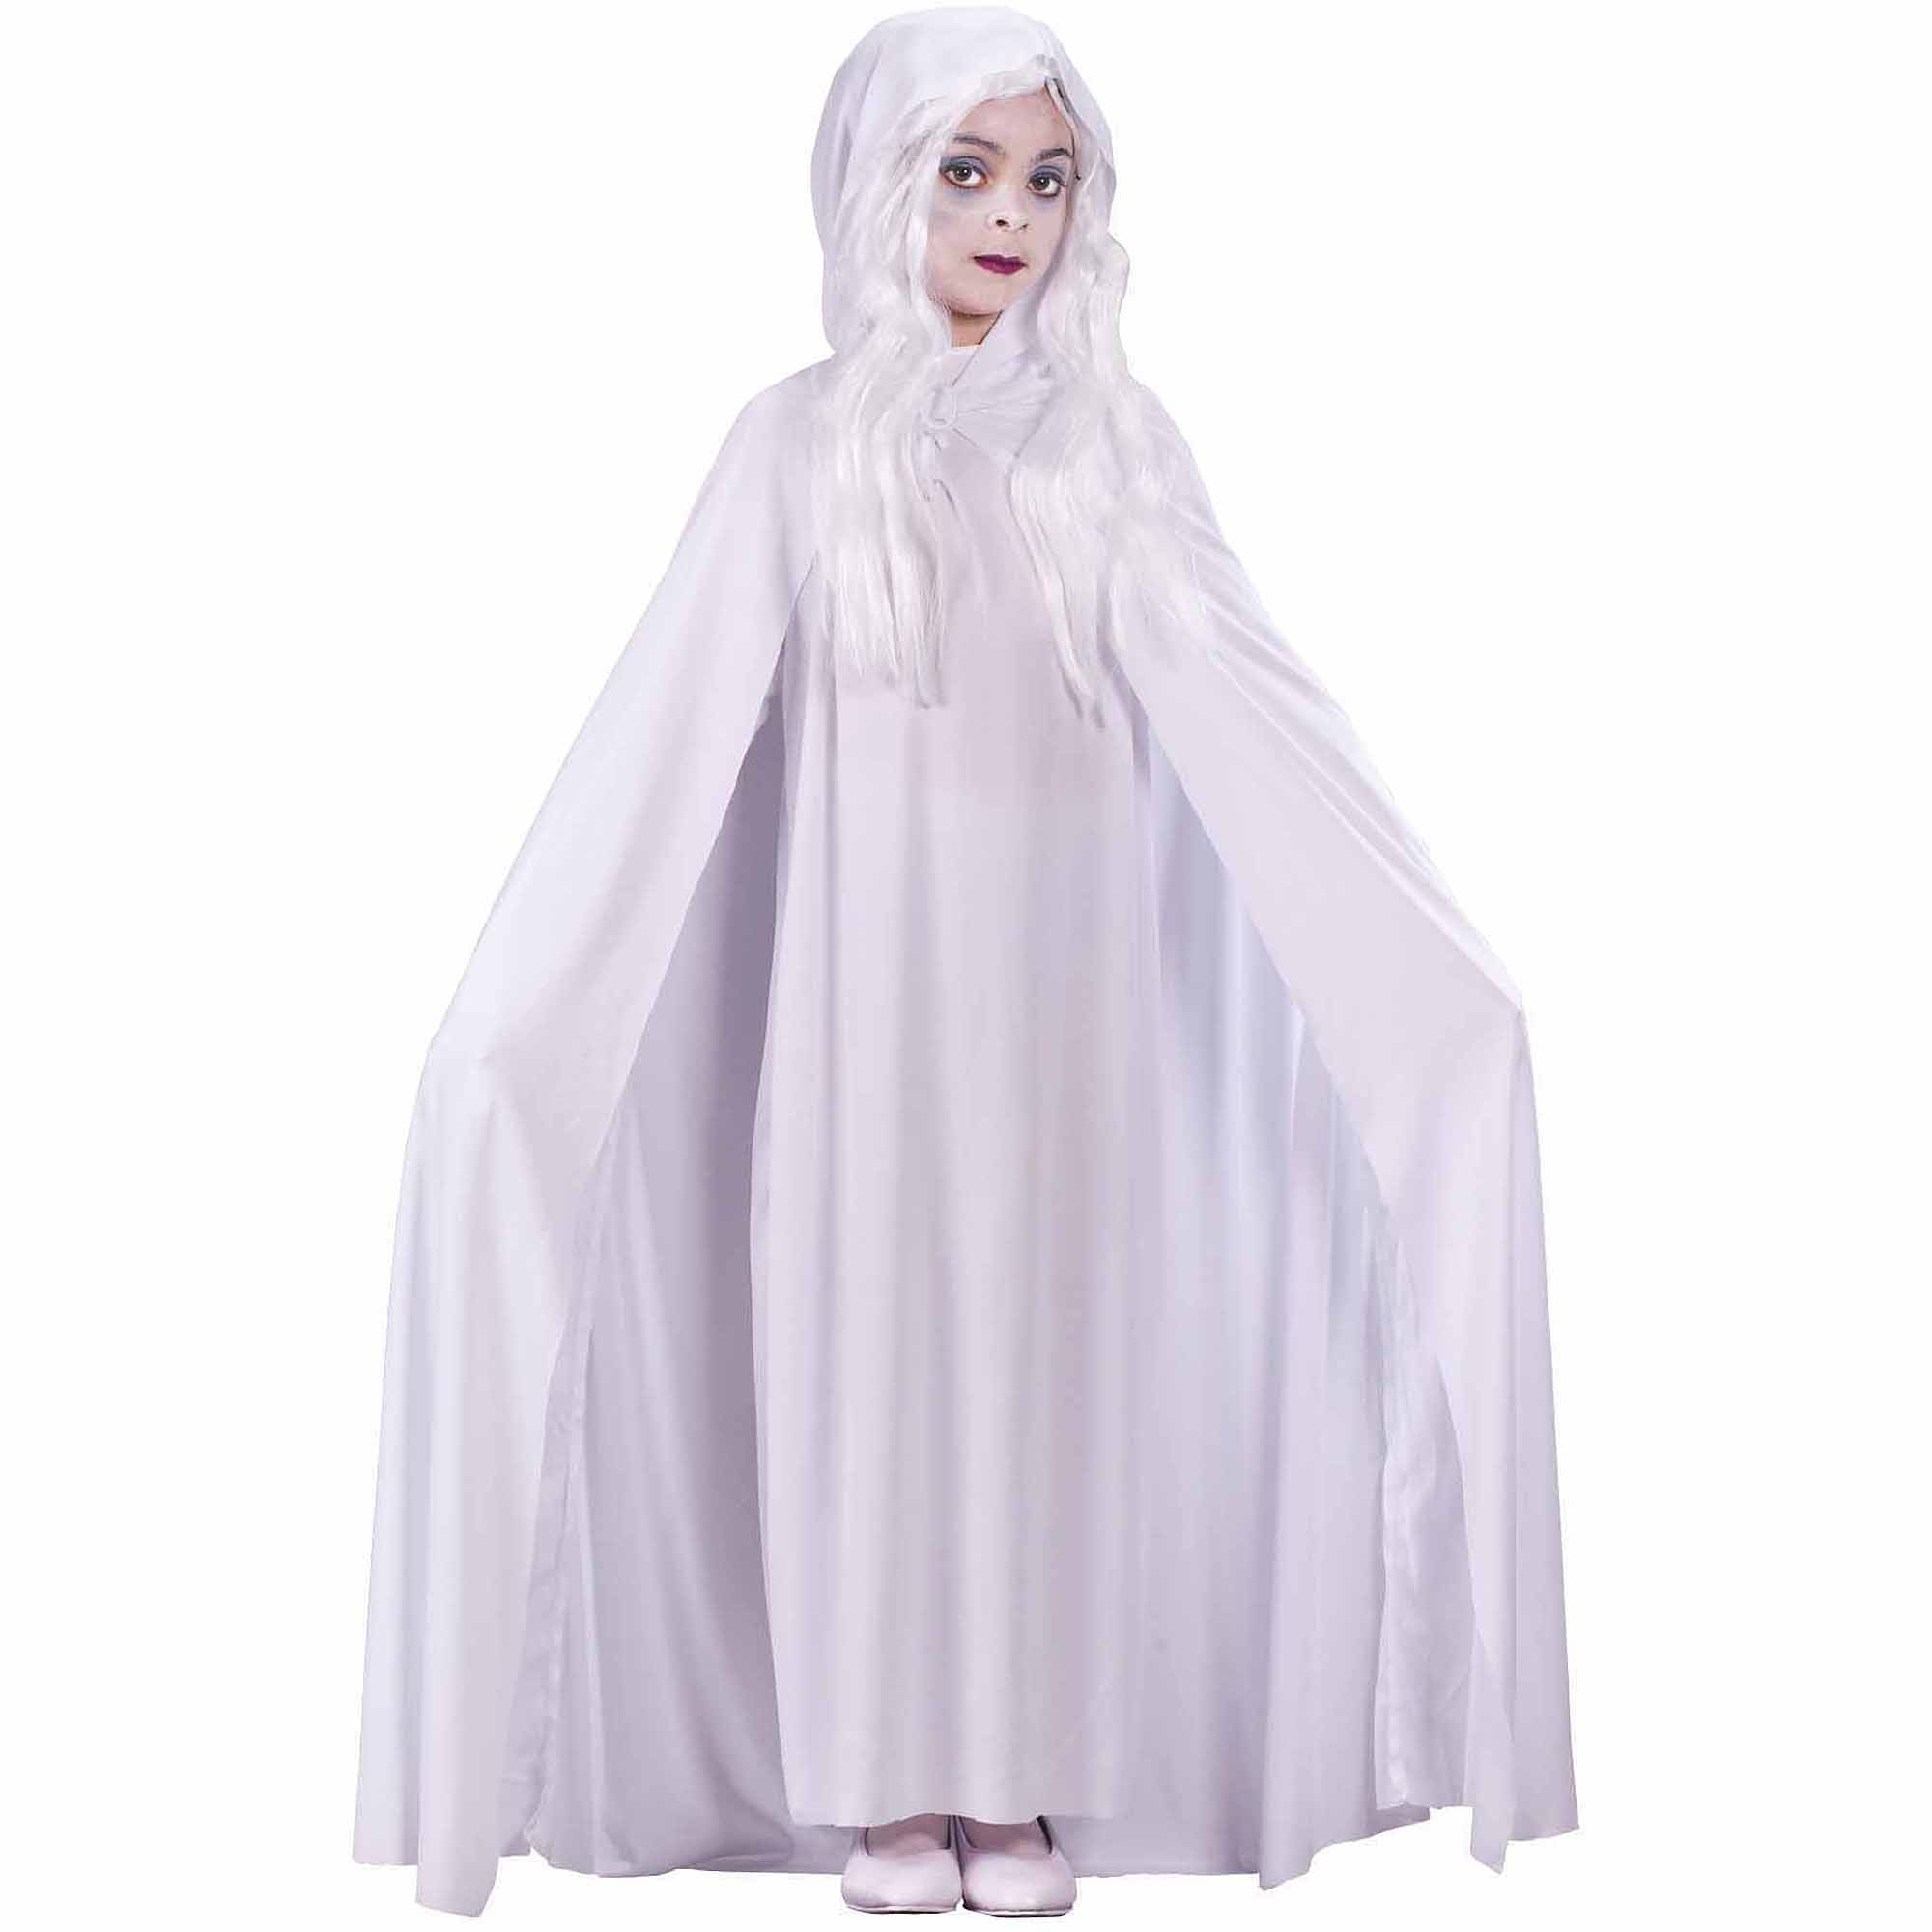 Gossamer Ghost Child Halloween Costume